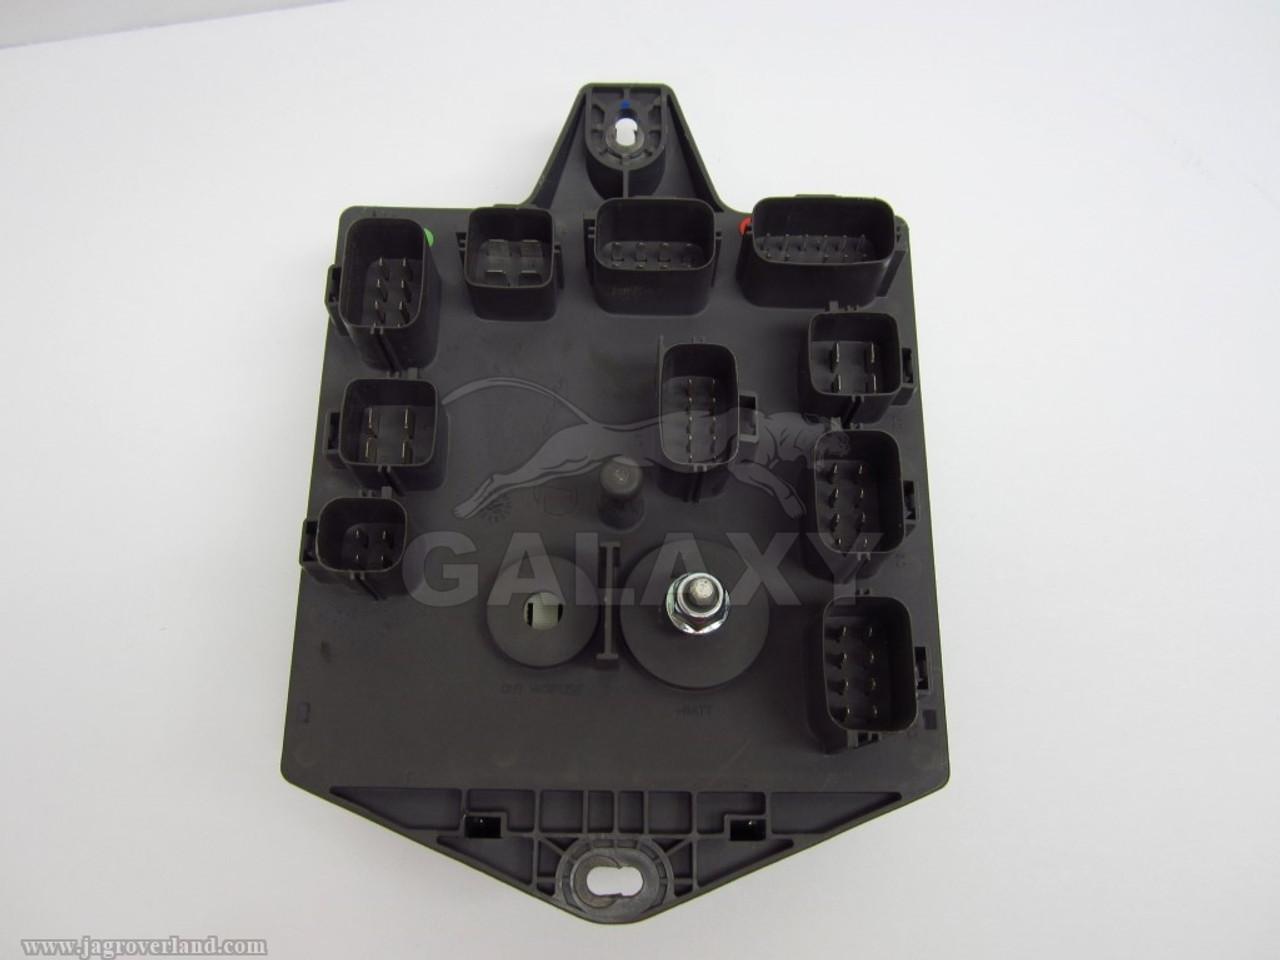 08 09 xj8 xjr rear trunk mounted fuse and relay box oem c2c34455 7w93  [ 1280 x 960 Pixel ]